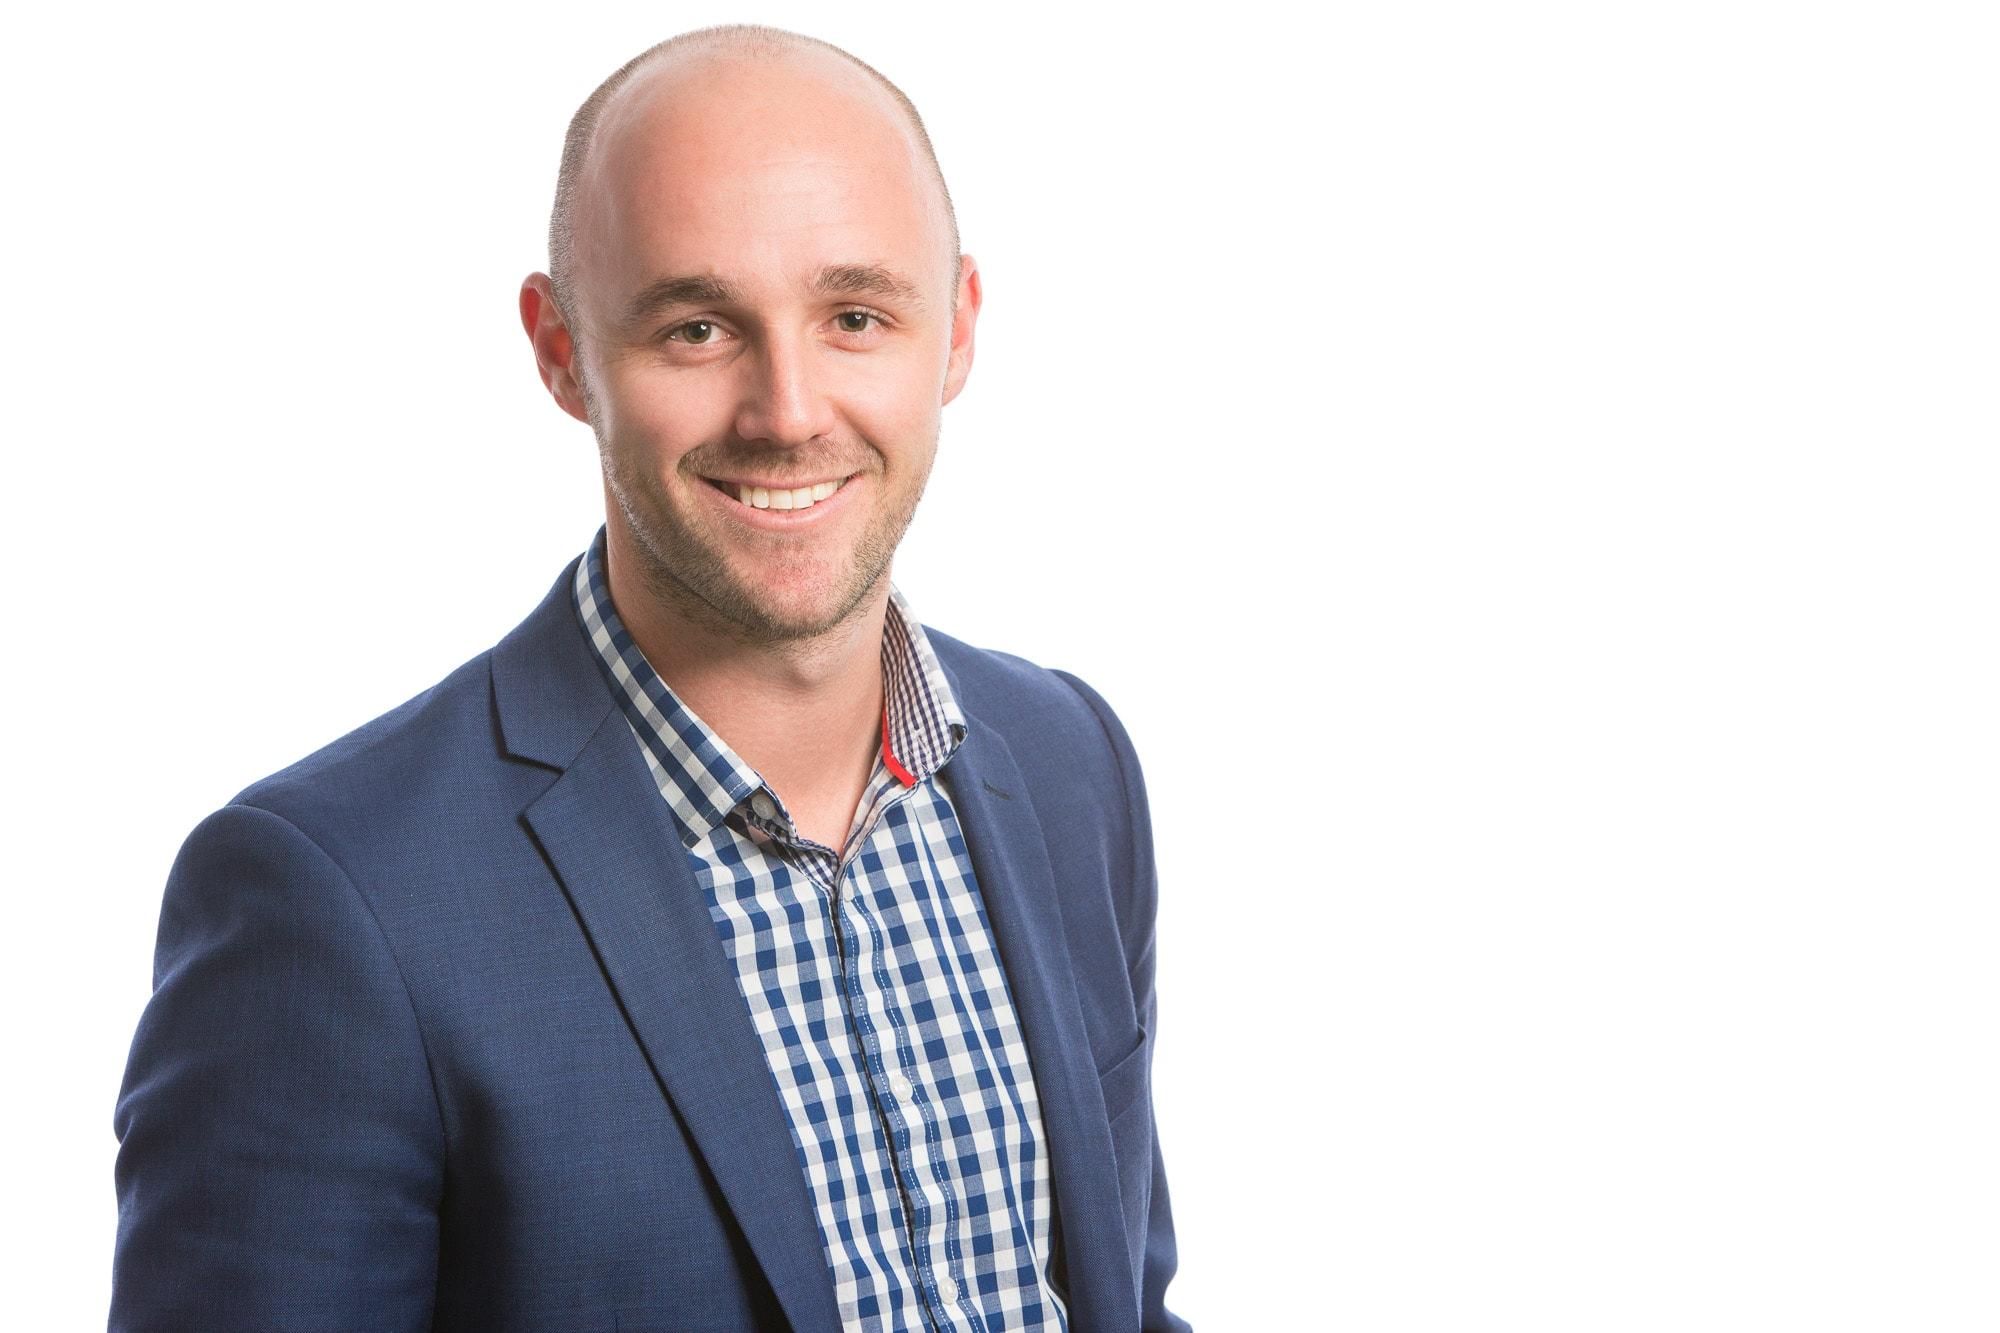 Brisbane Corporate Headshot